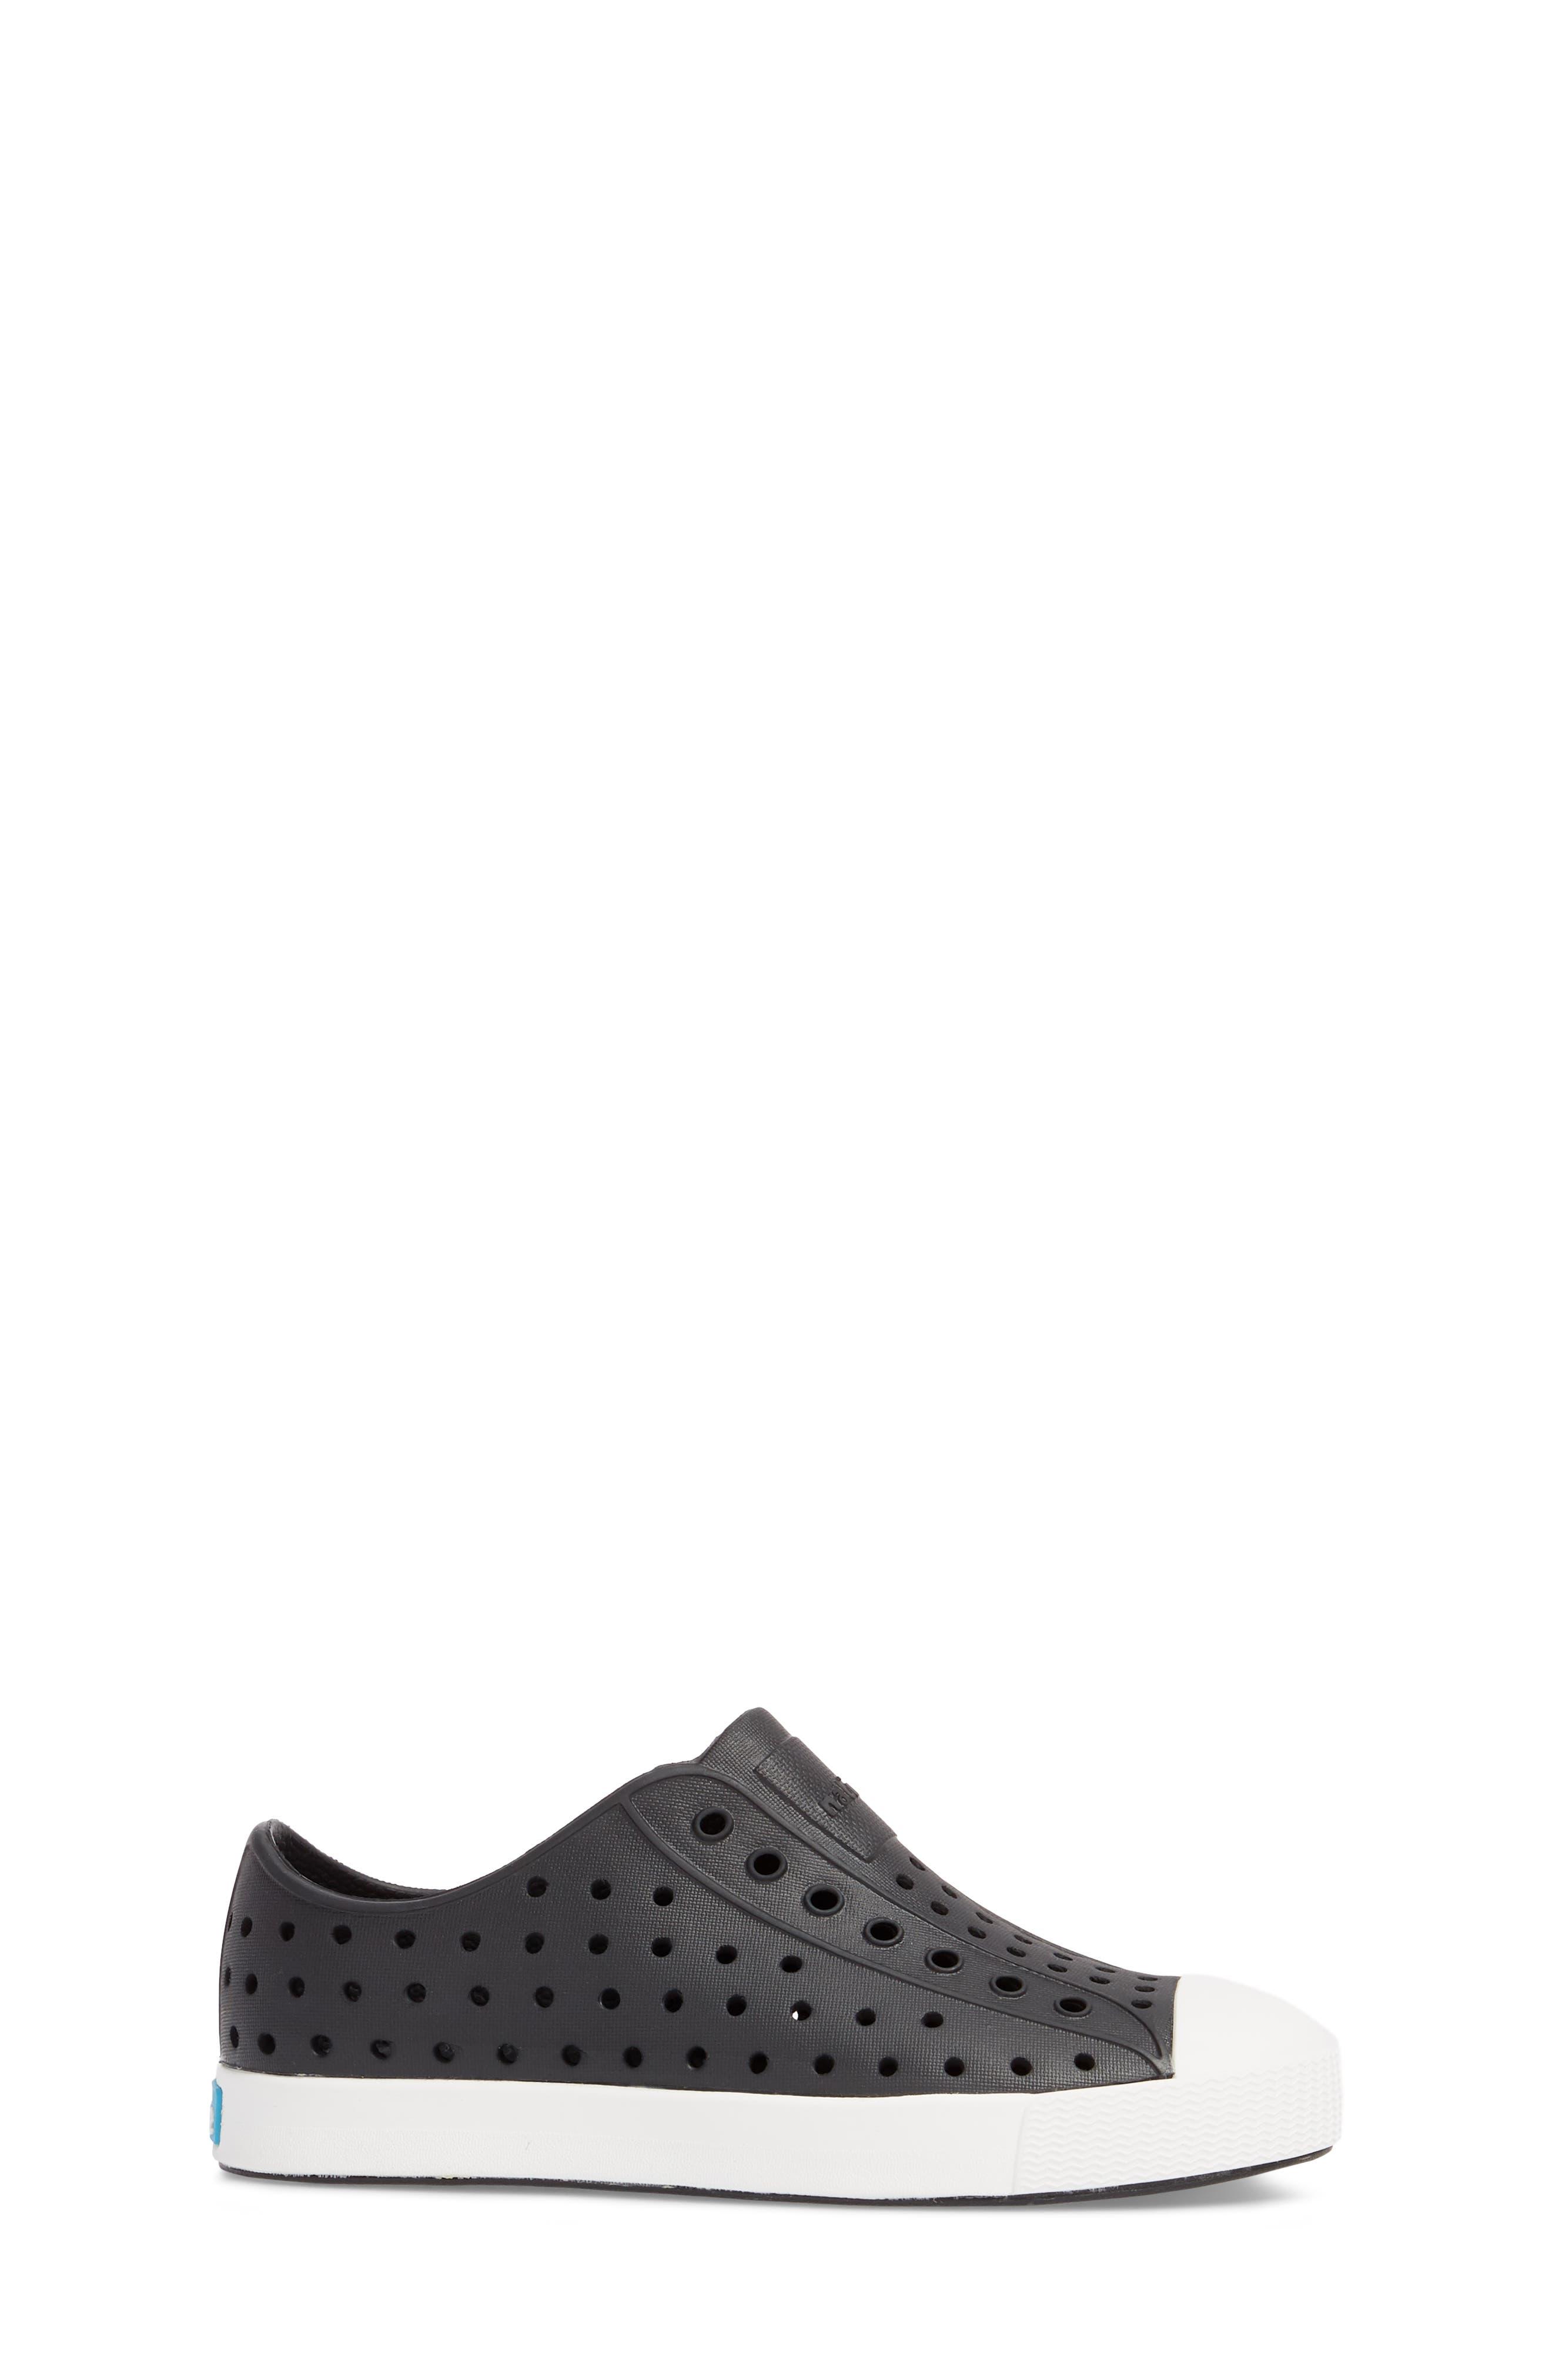 'Jefferson' Water Friendly Slip-On Sneaker,                             Alternate thumbnail 121, color,